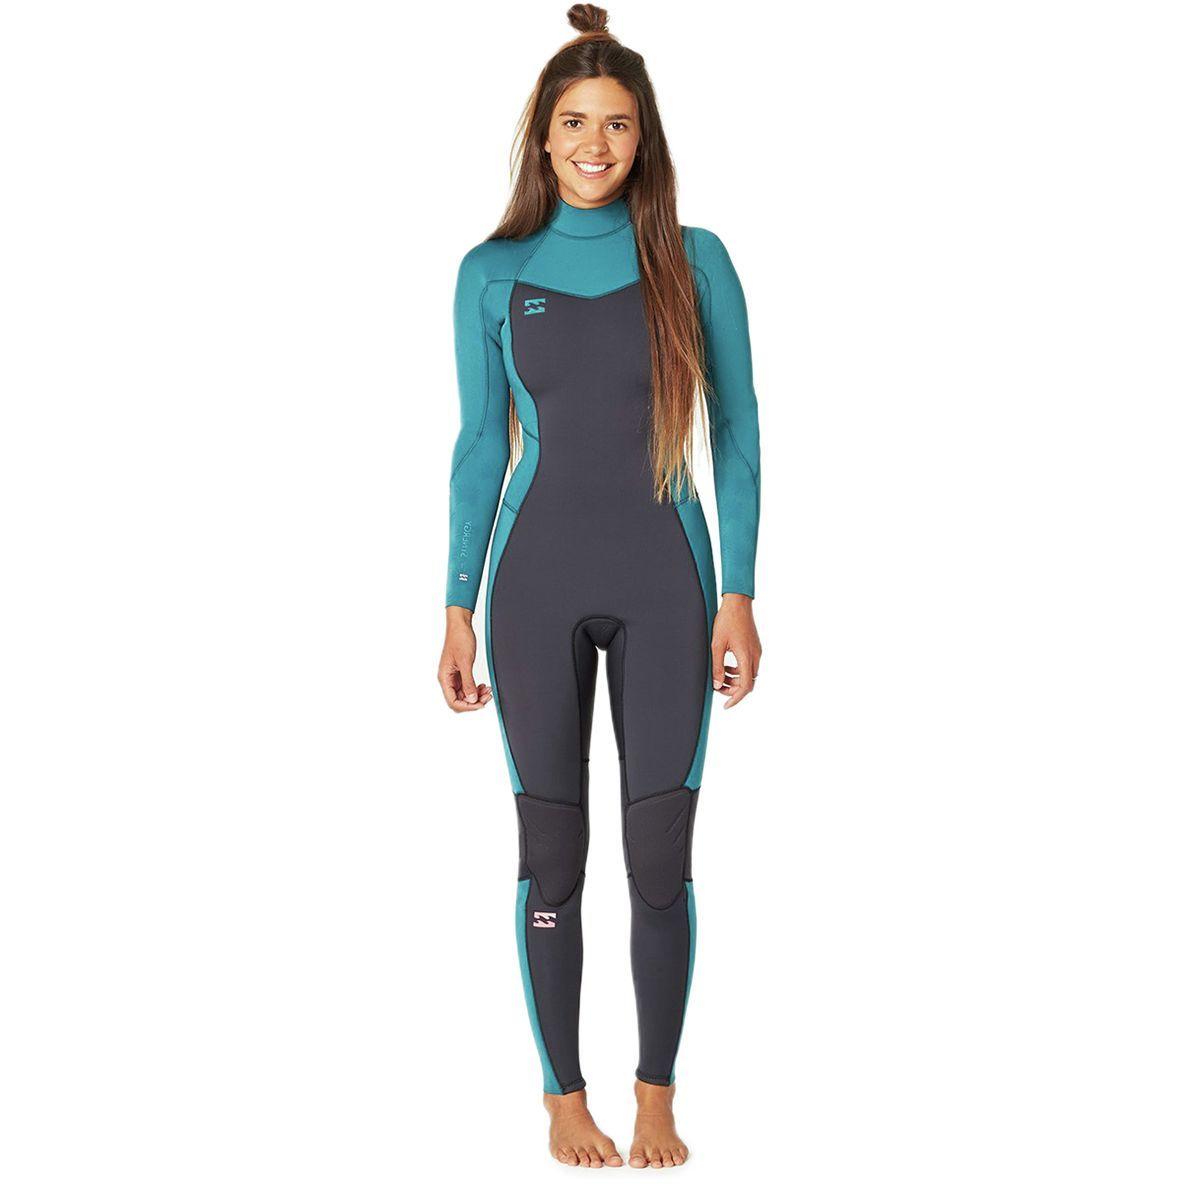 Billabong 3/2mm Furnace Synergy Back Zip GBS Full Wetsuit - Women's